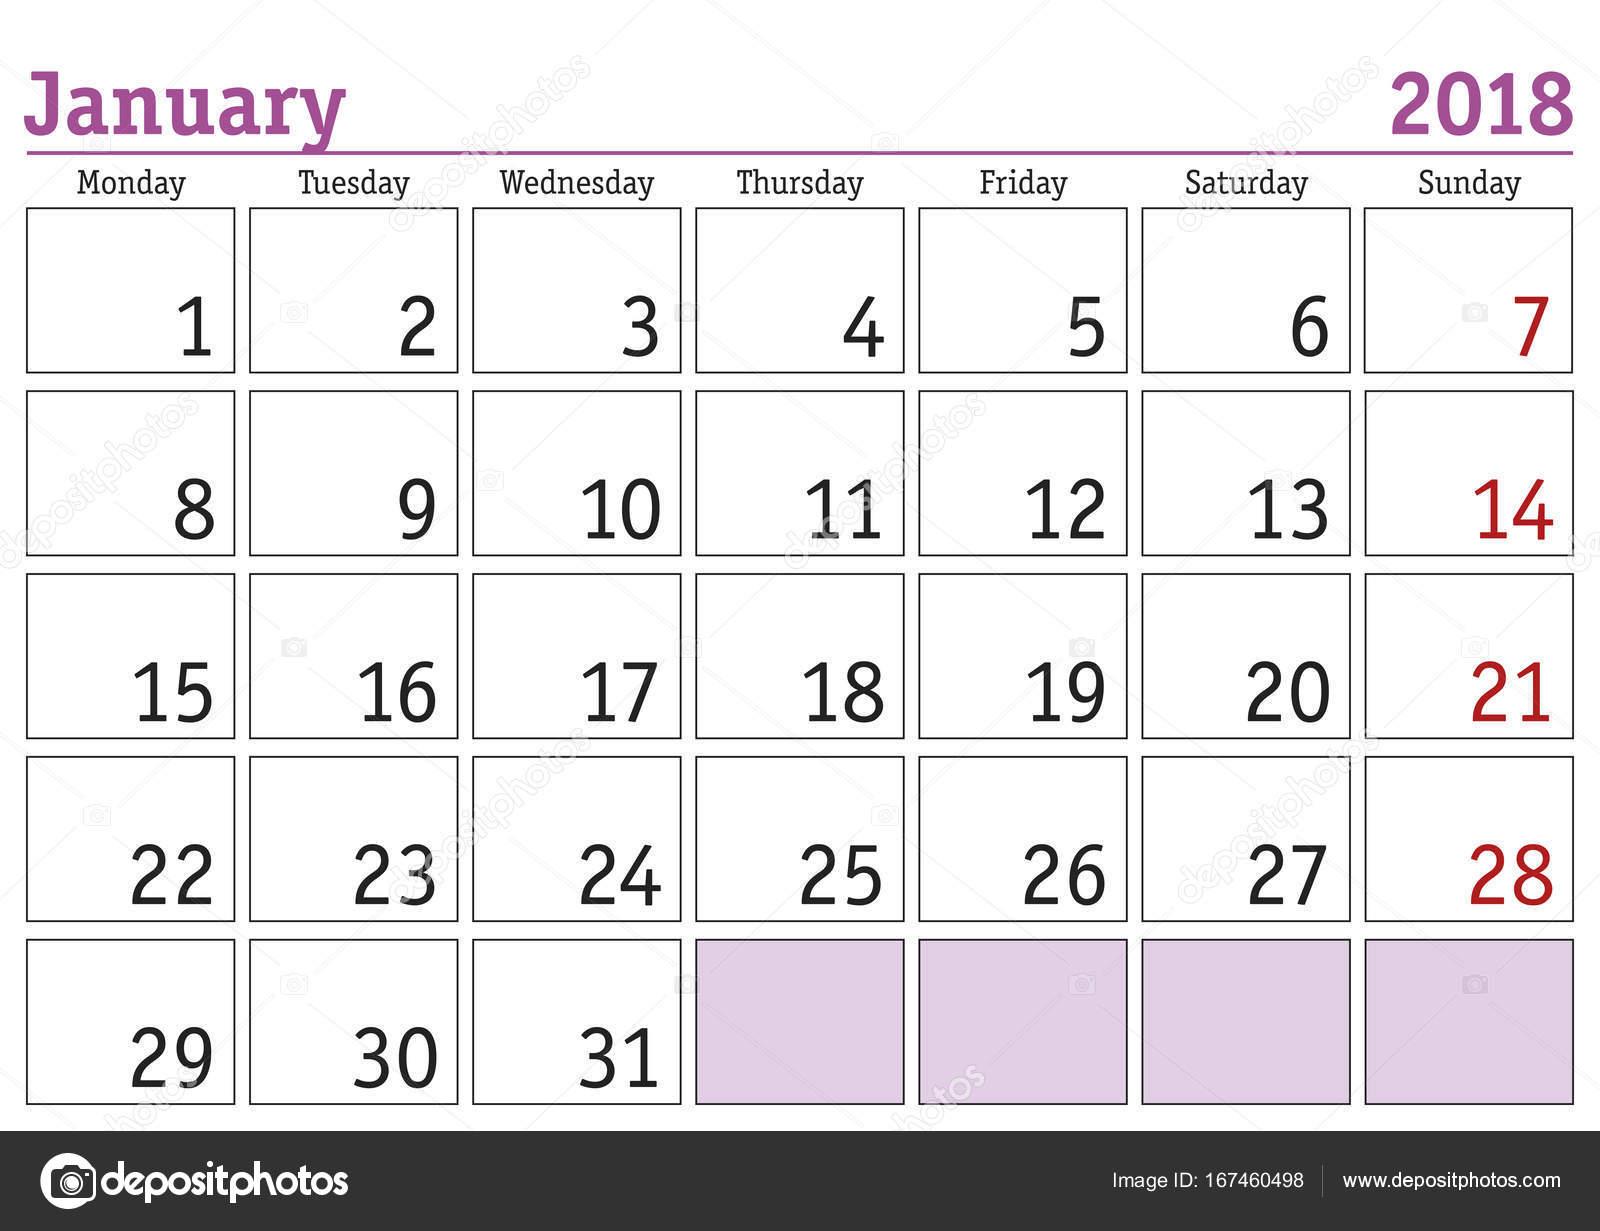 simple digital calendar for january 2018 vector printable calendar monthly scheduler week starts on monday english calendar vector by alfonsodetomas